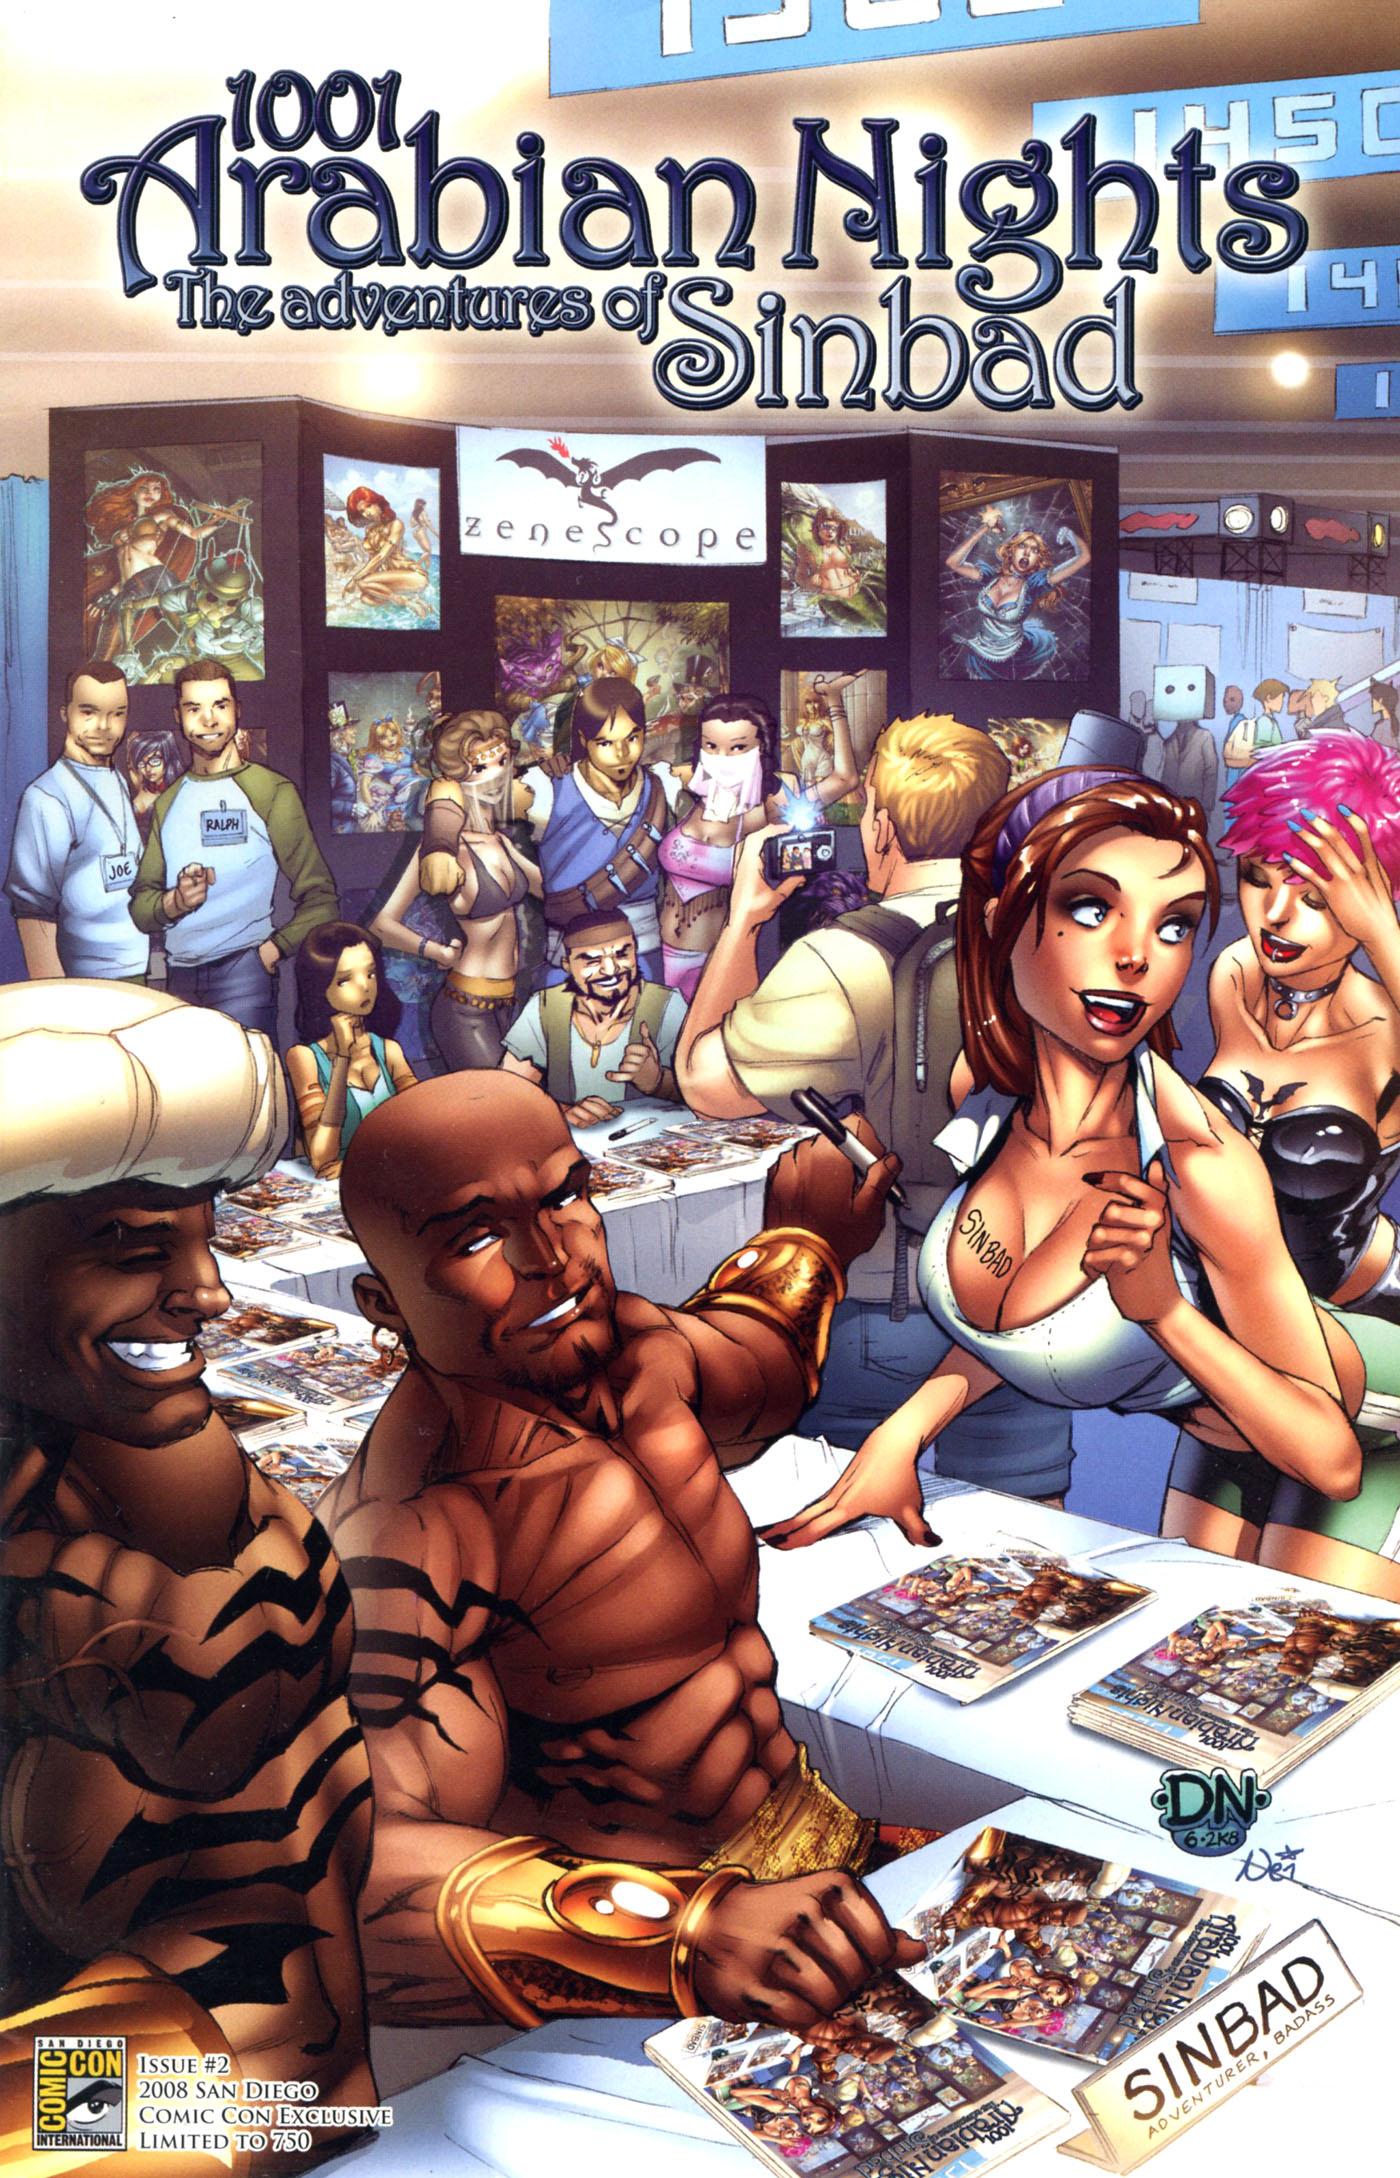 Read online 1001 Arabian Nights: The Adventures of Sinbad comic -  Issue #2 - 5